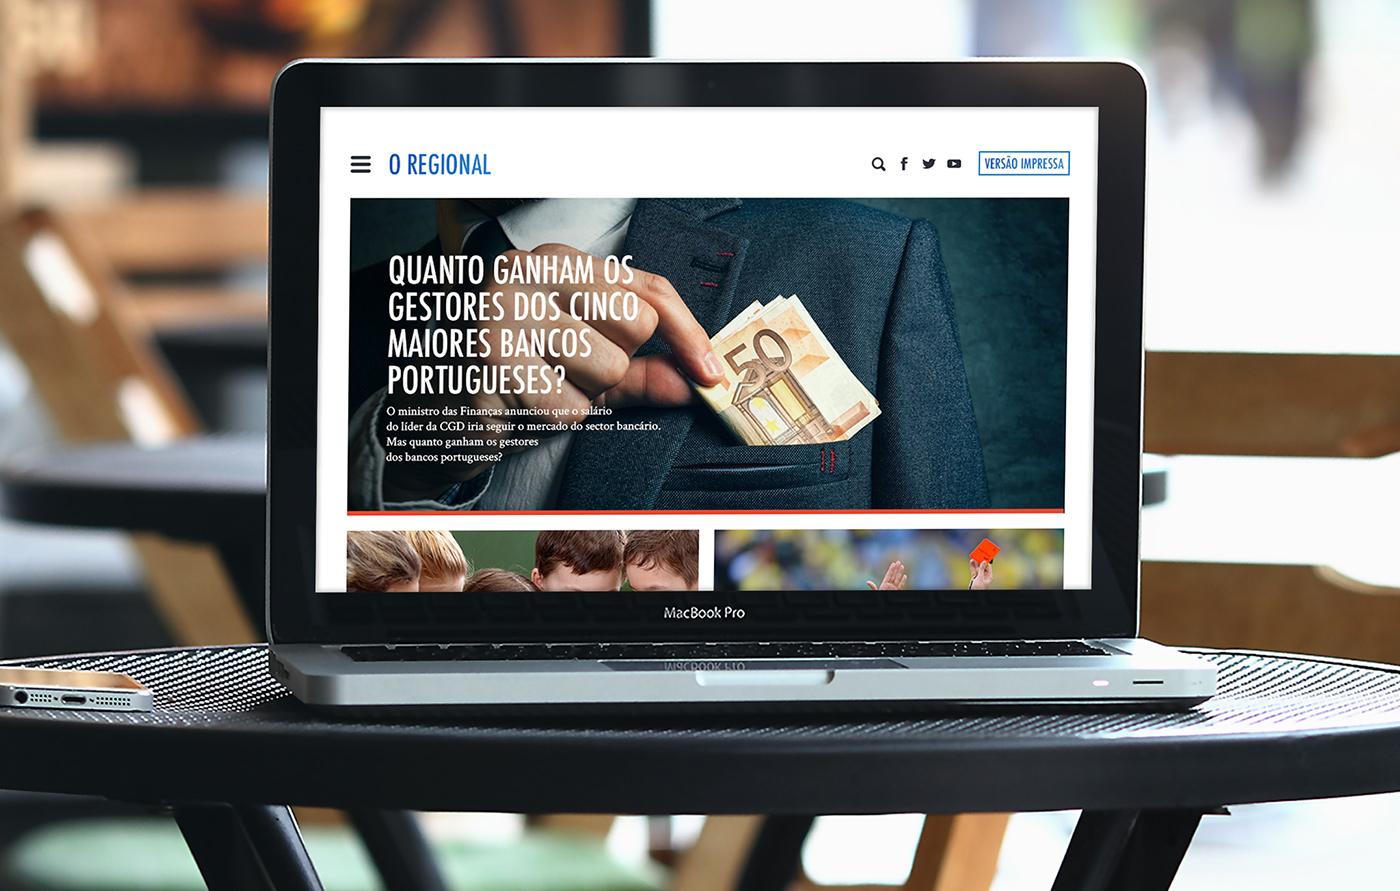 redesign ux/ui Website